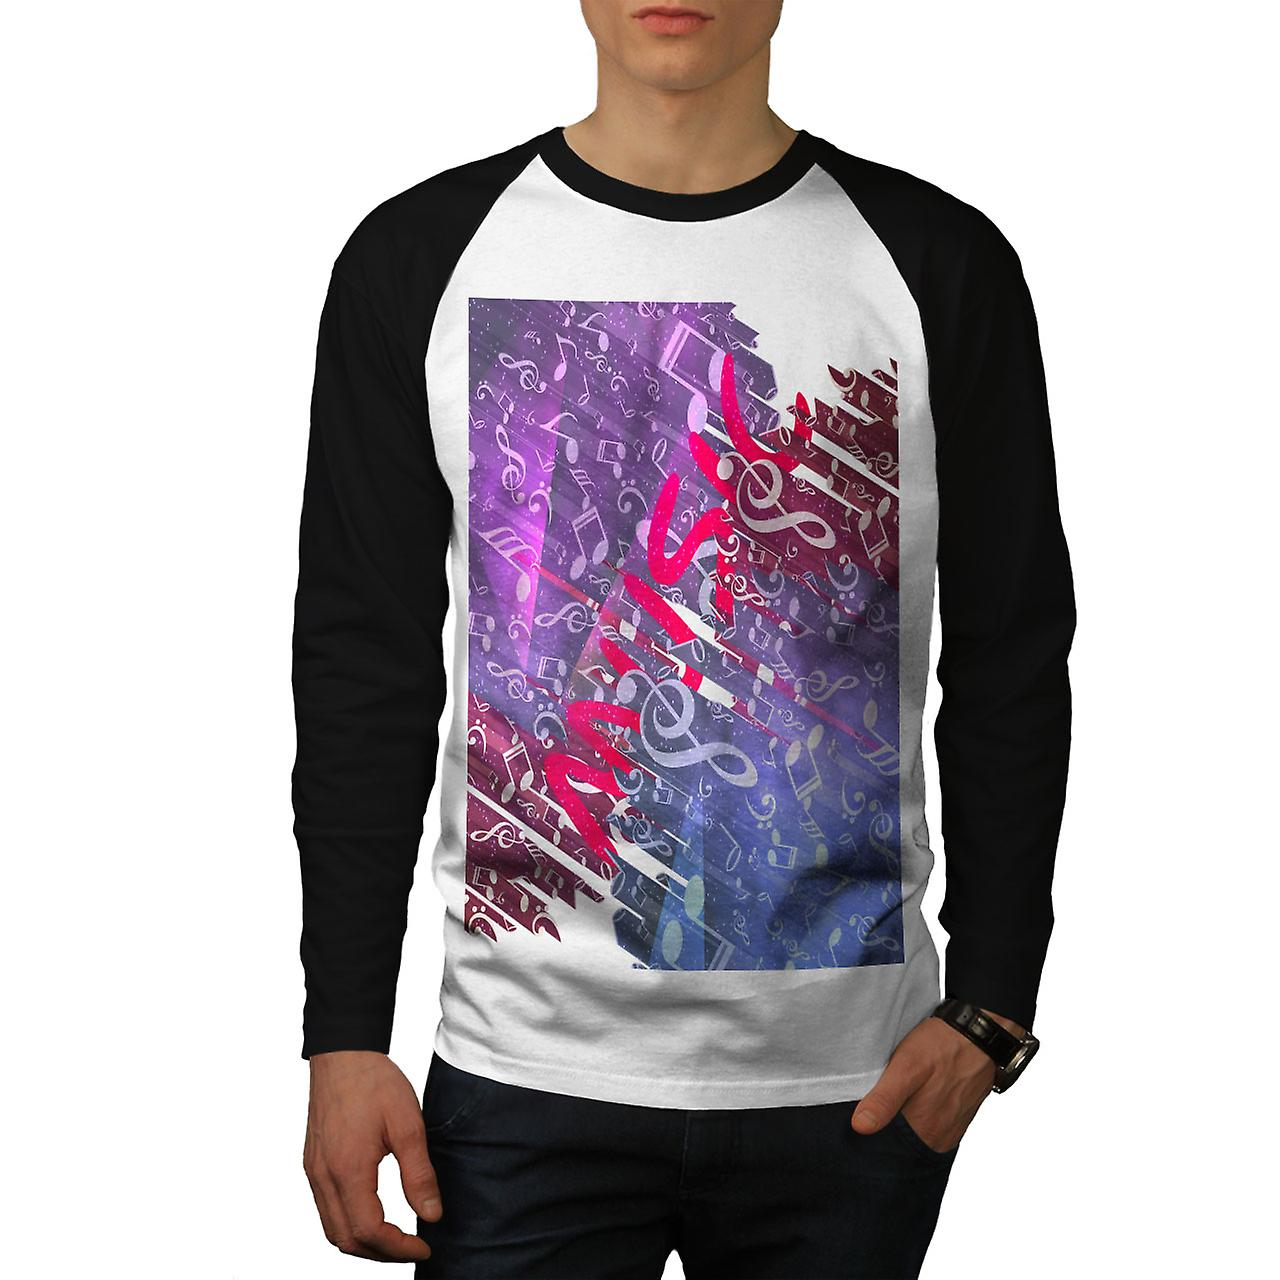 30a5d679d6689e Base Song Dance Music Men White (Black Sleeves)Baseball LS T-shirt ...